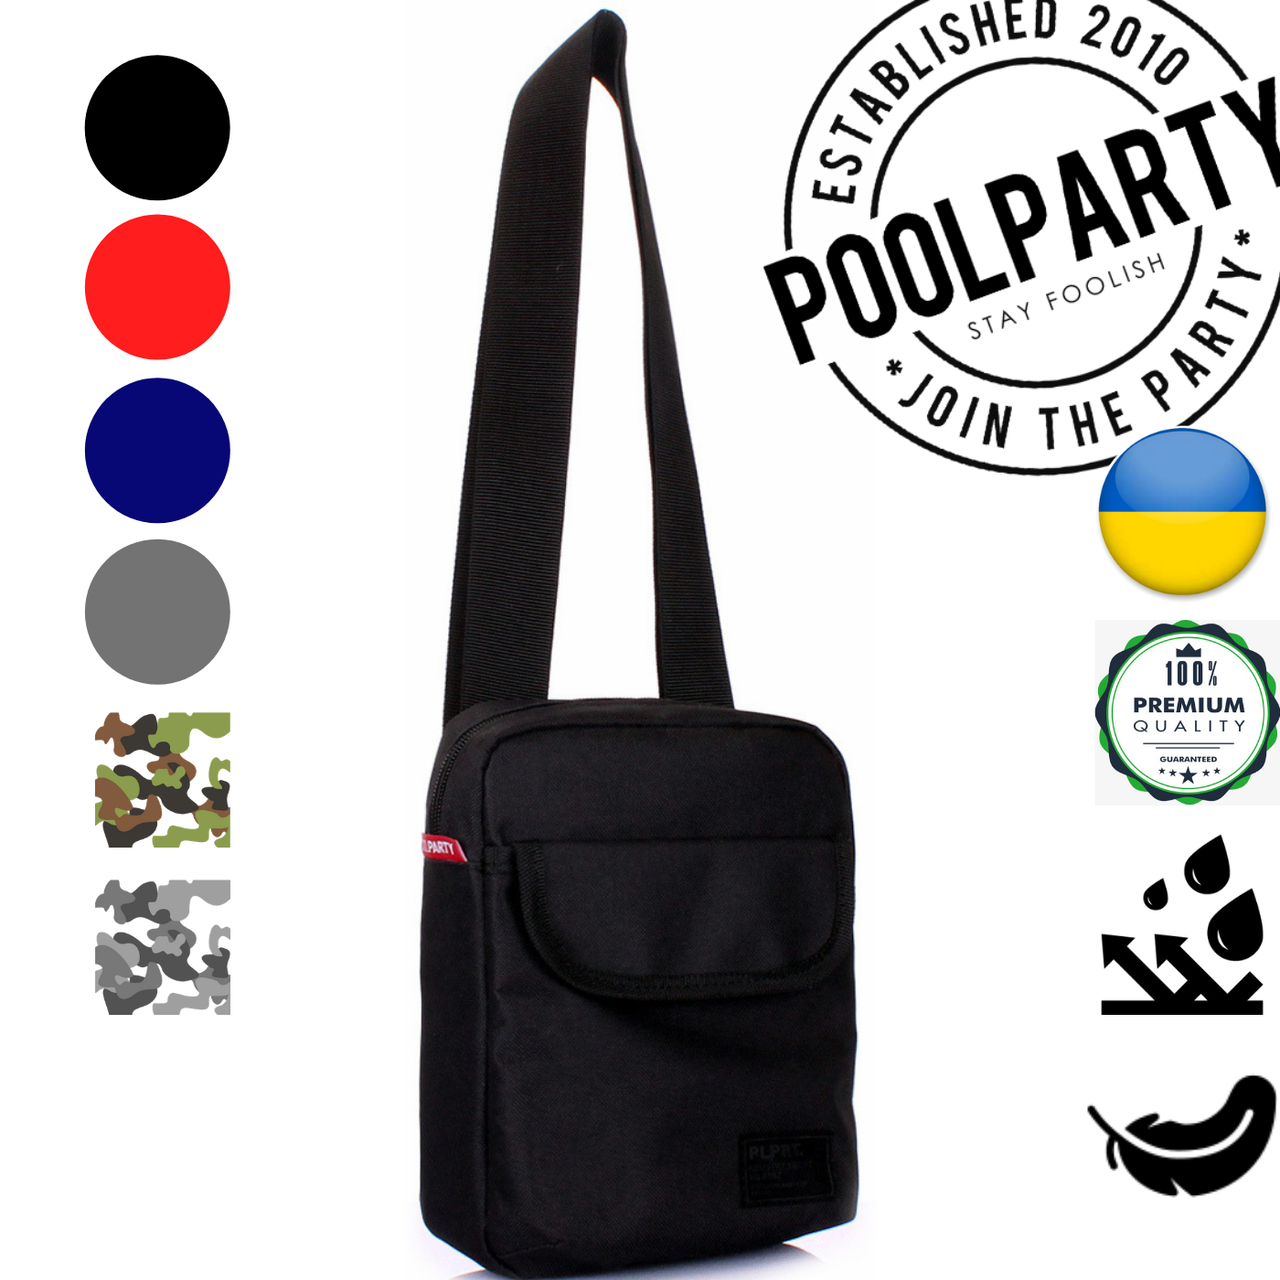 10bdf21e2859 Мужская сумка черная Poolparty Extreme Oxford Black полиэстер с ремнем на  плечо - abaz.com